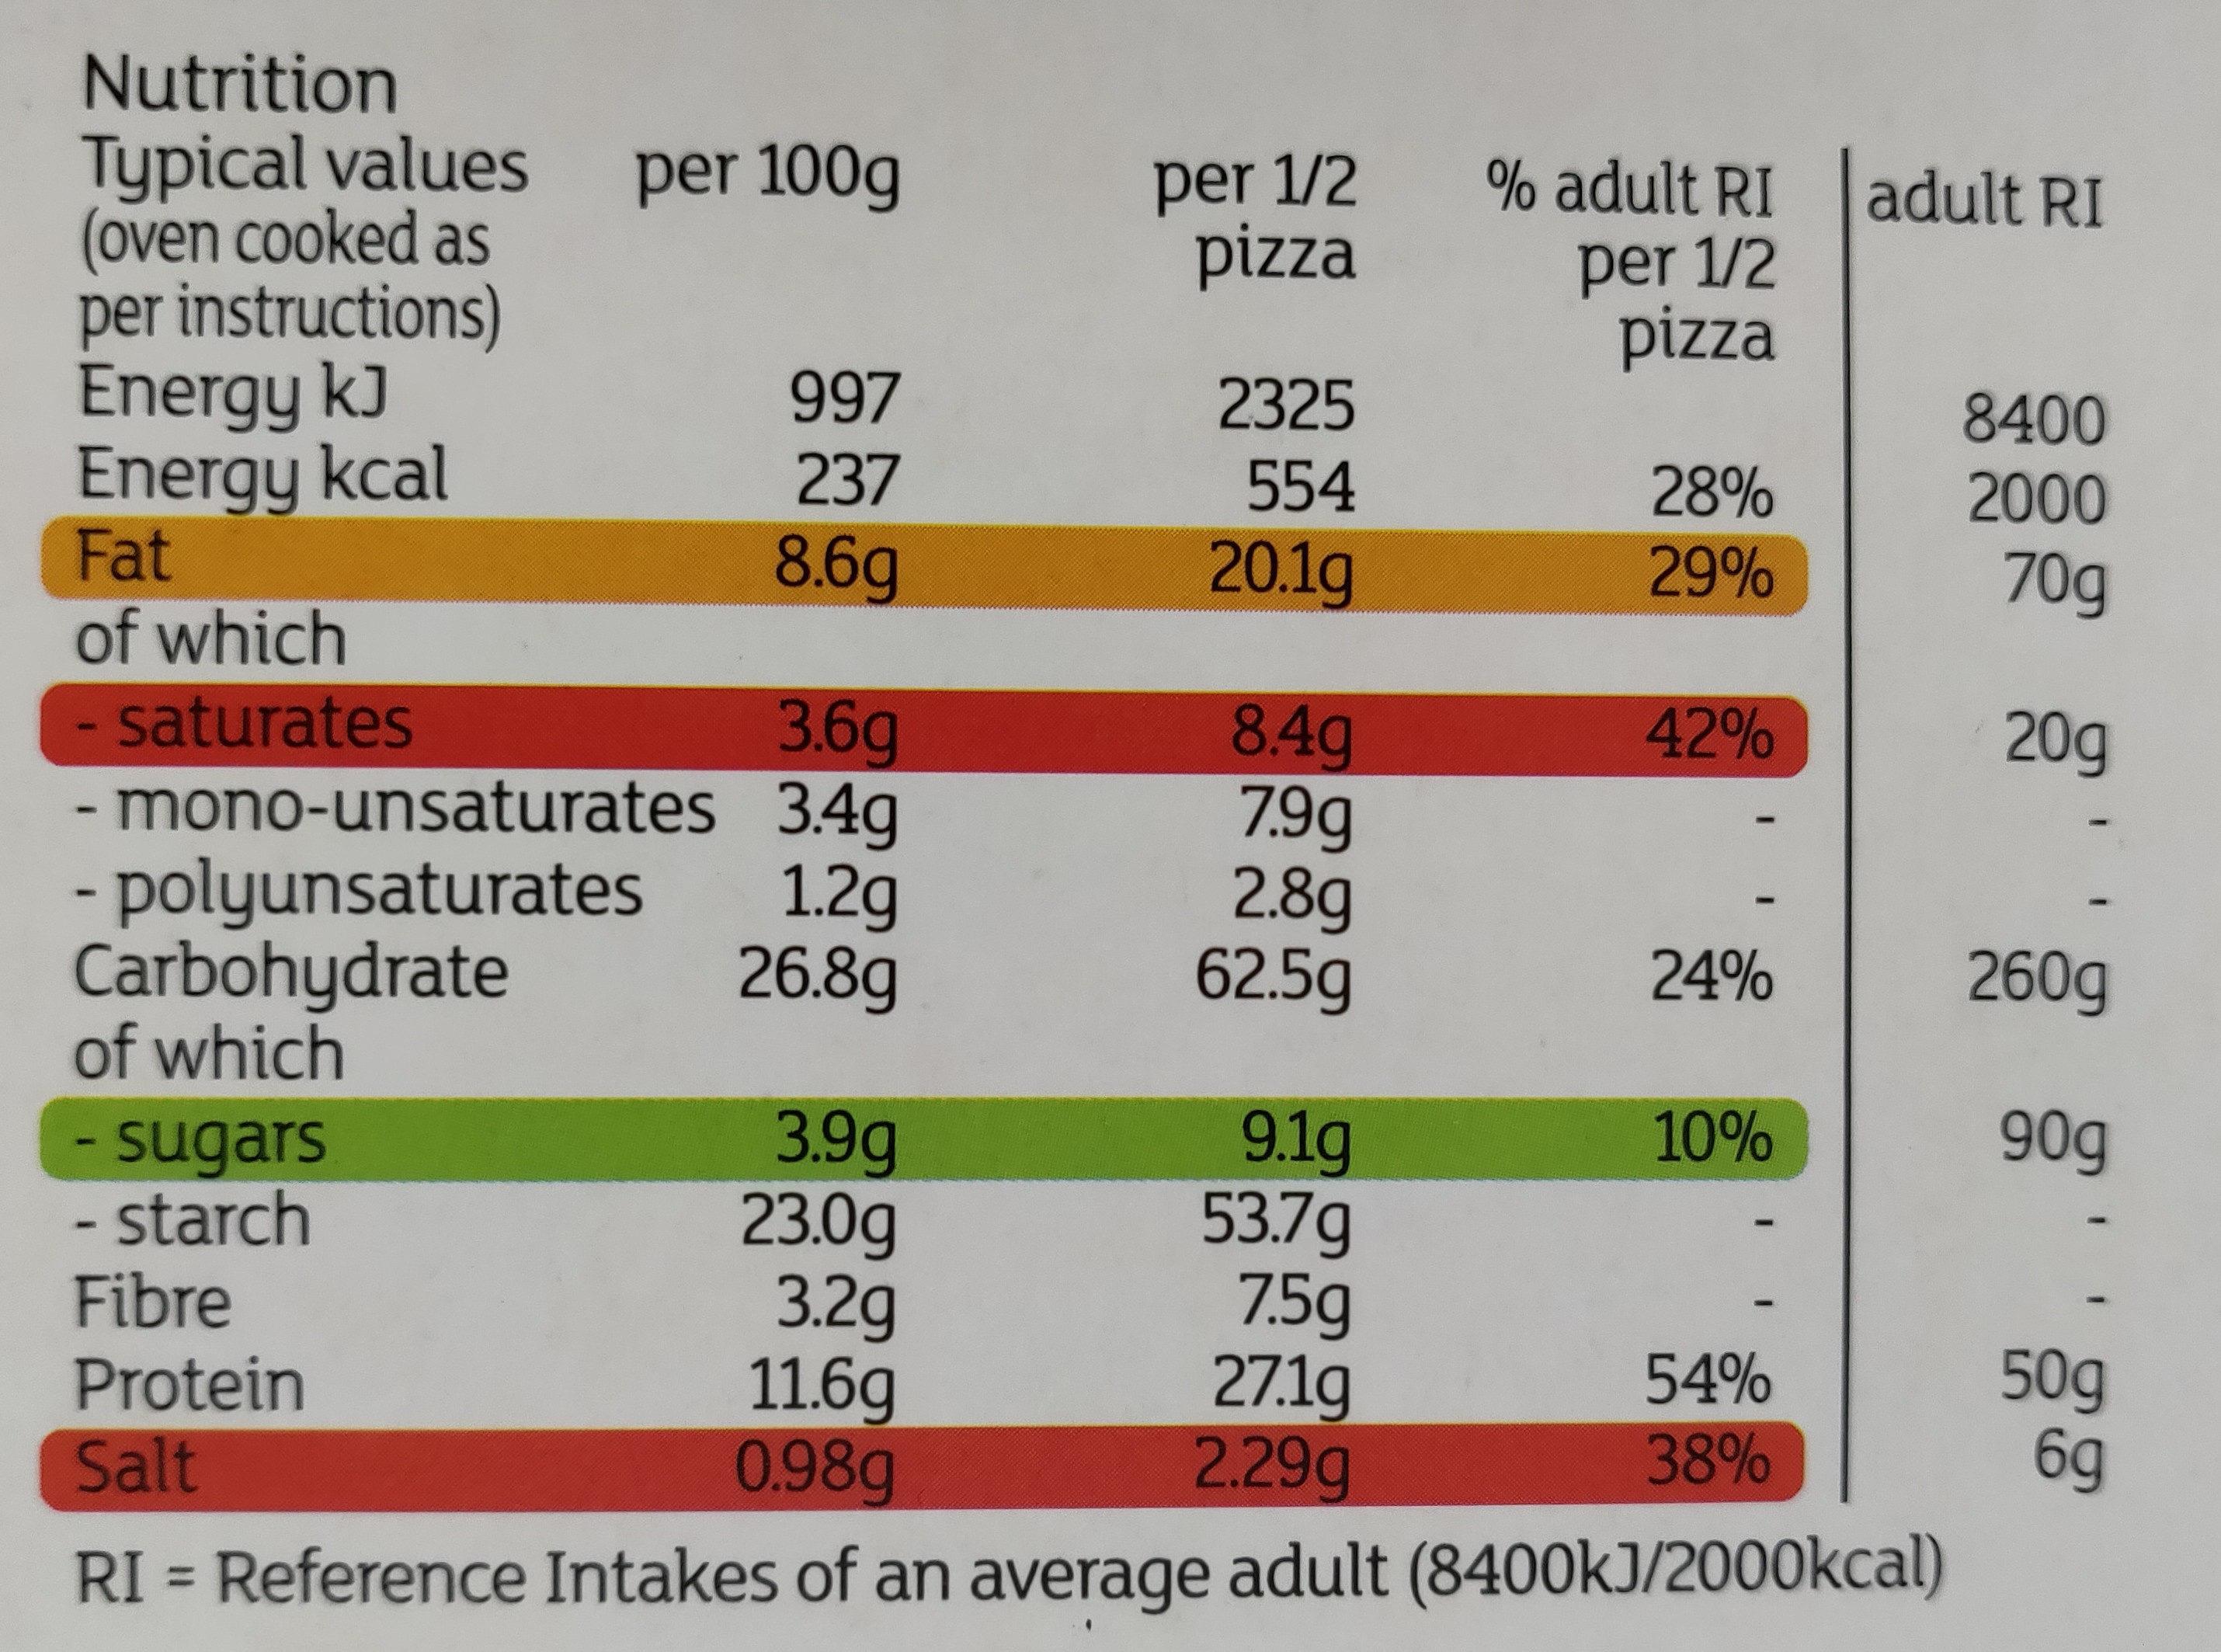 Bocconcini mozzarella & Sunblush cherry tomatoes - Nutrition facts - en